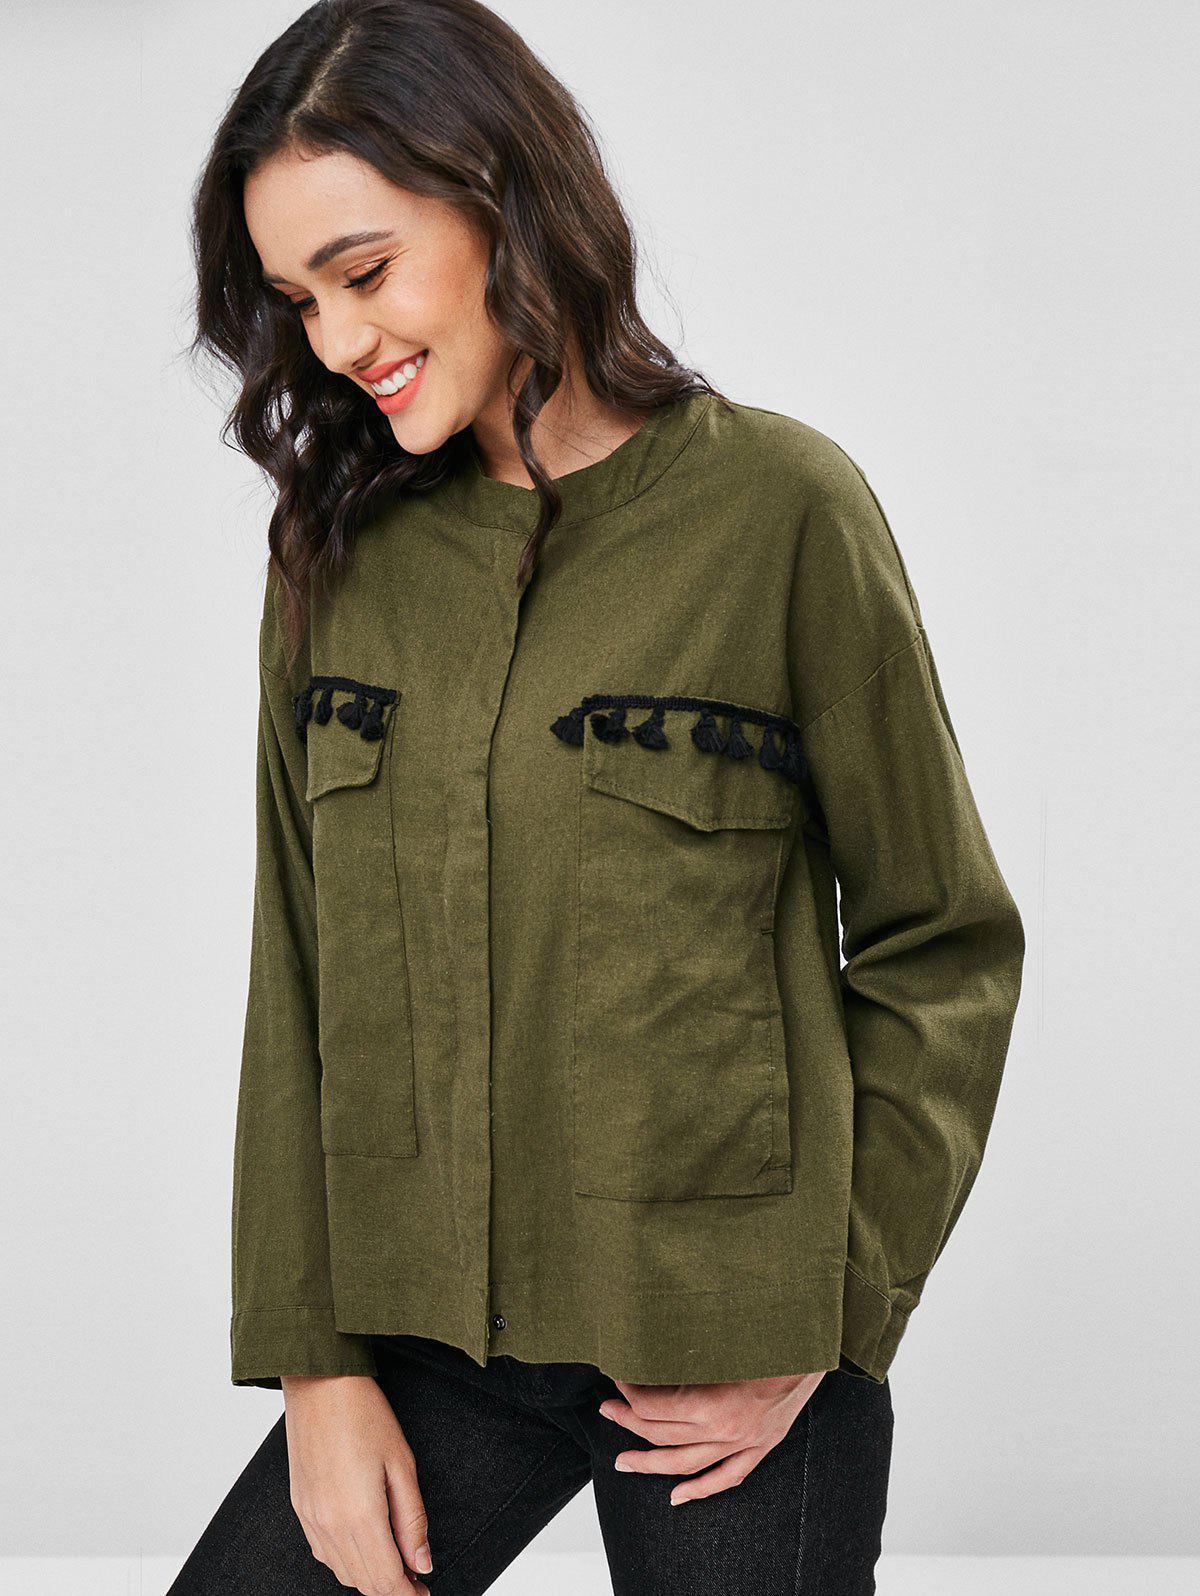 Tassels Zip Up Shirt Jacket